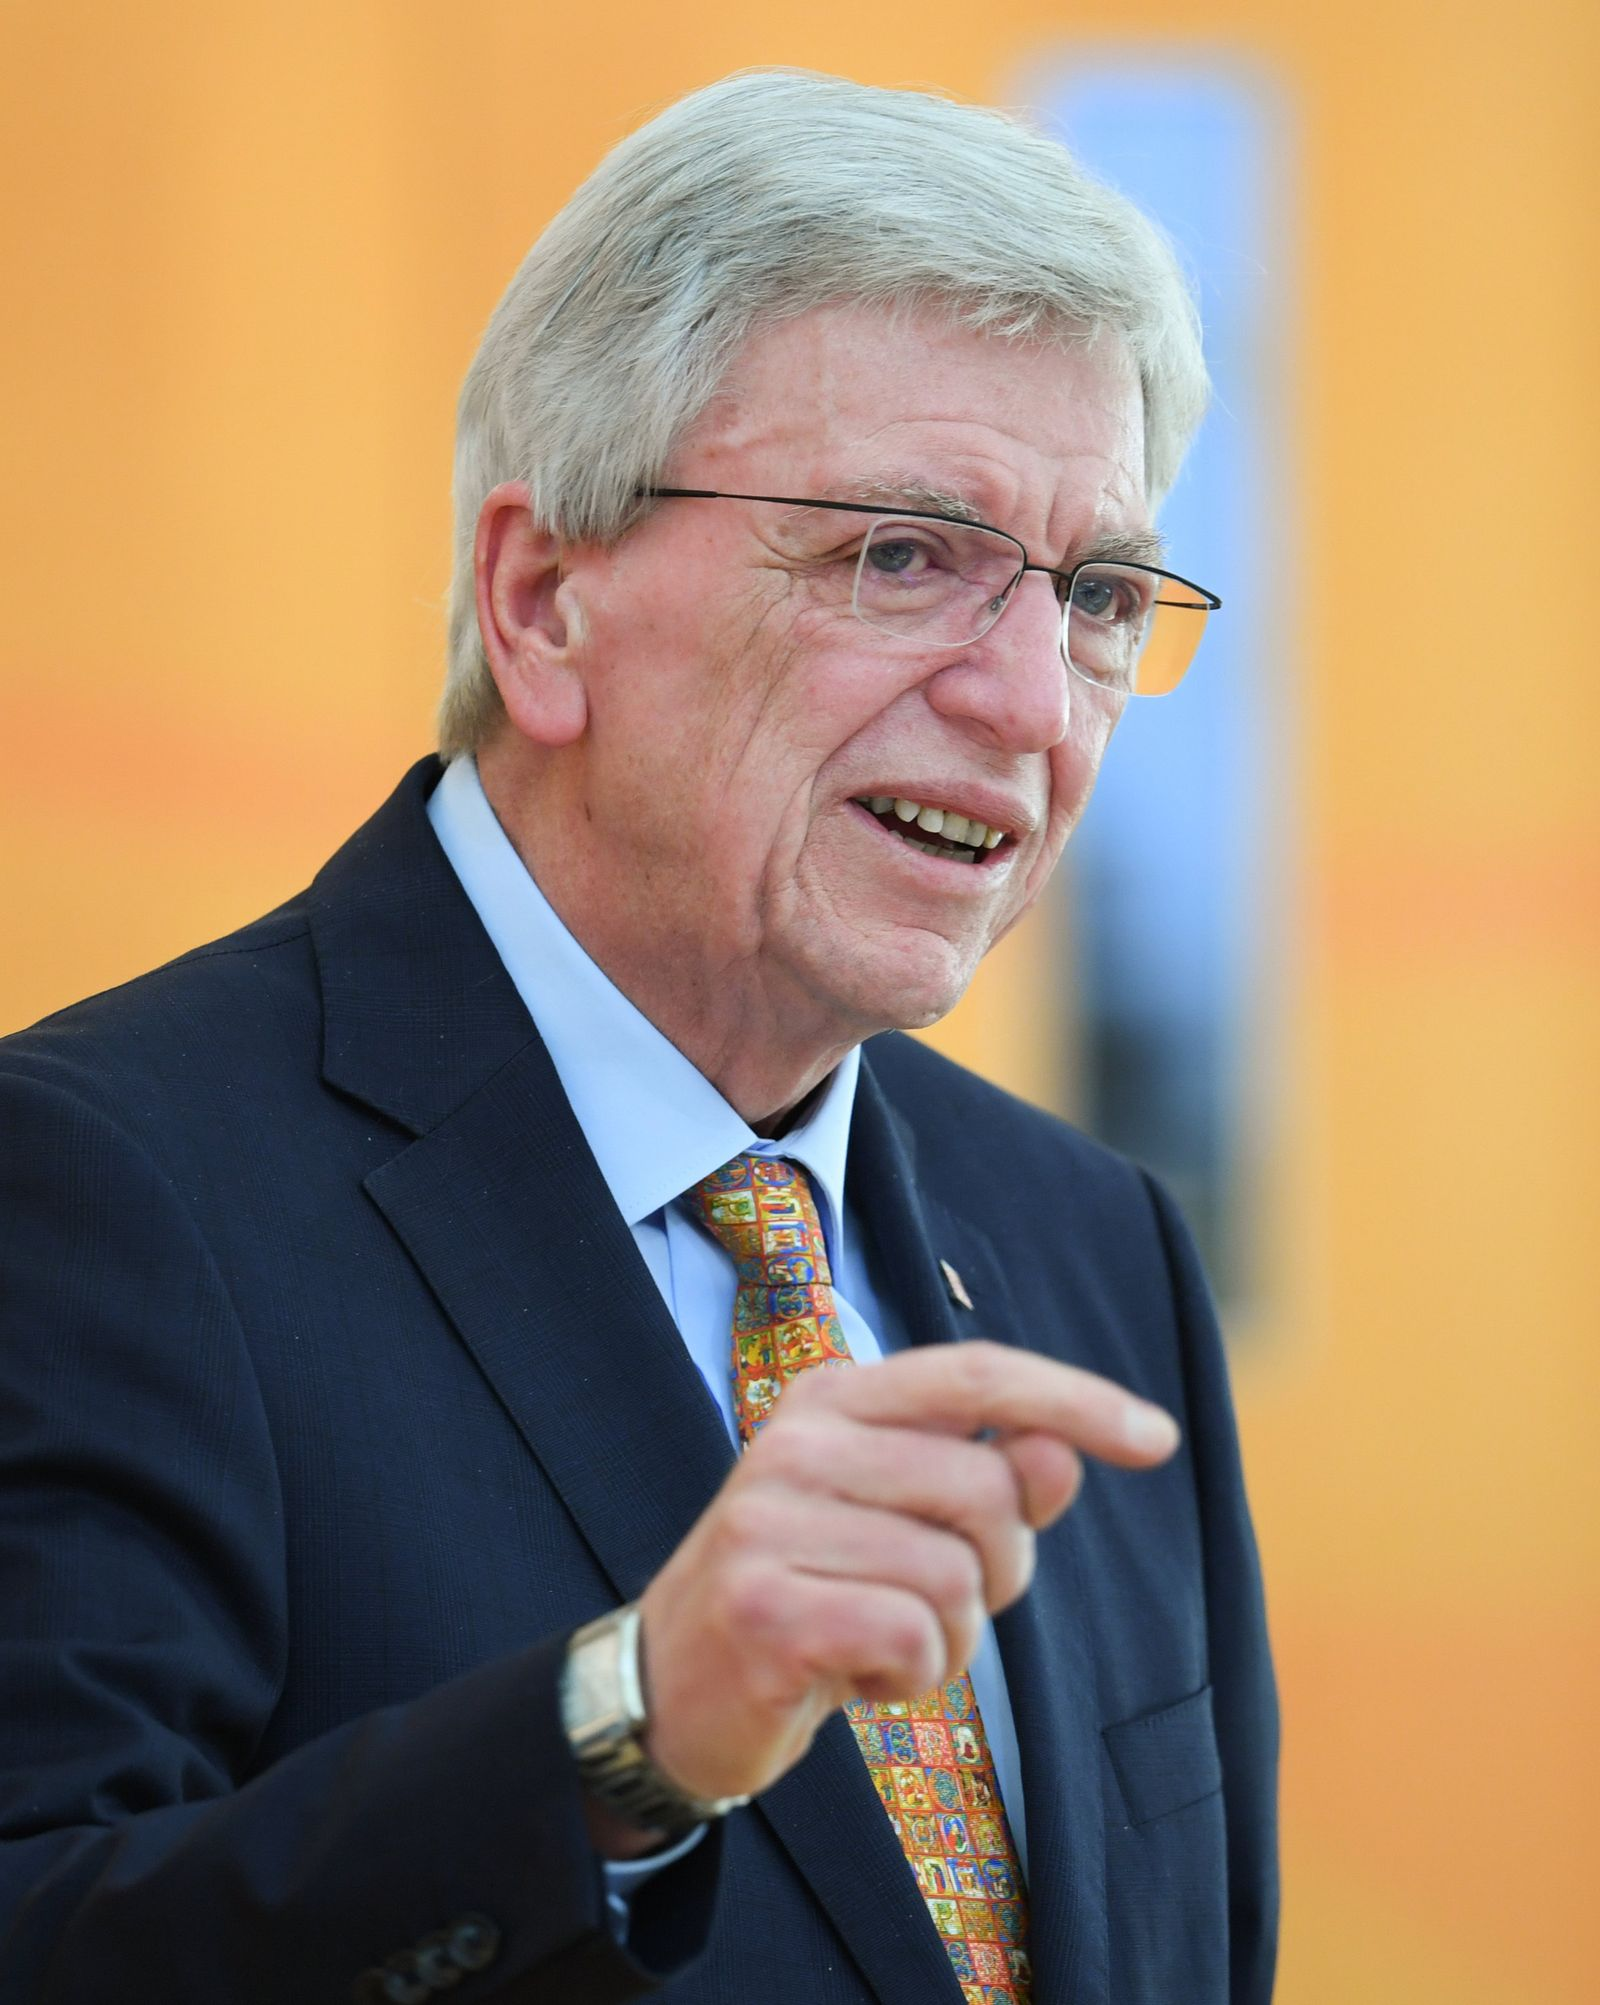 Bouffier (CDU), Ministerpräsident des Landes Hessen